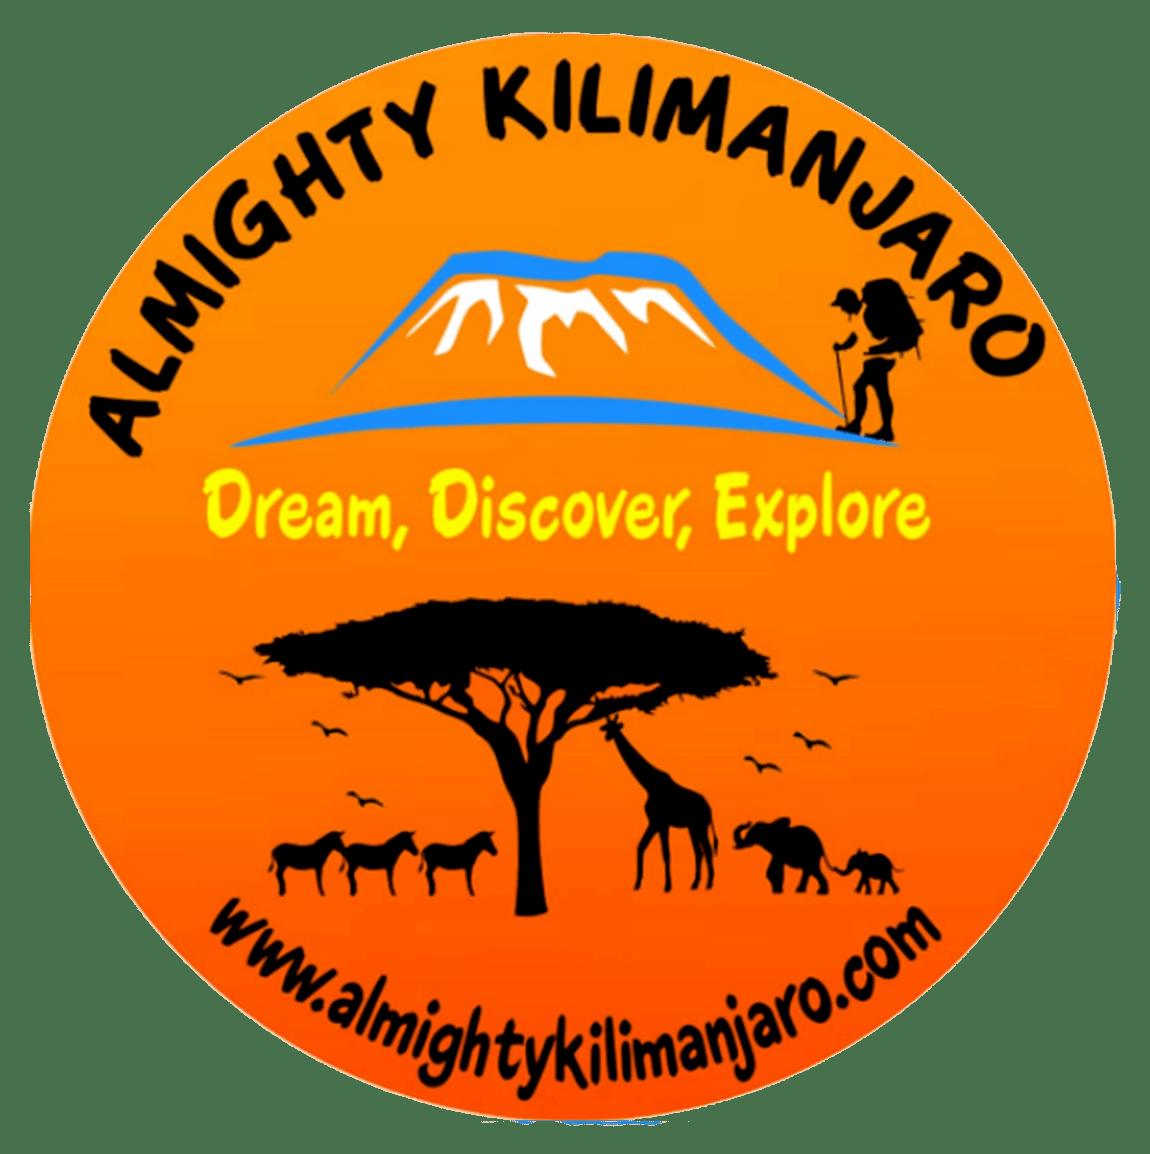 Almighty Kilimanjaro